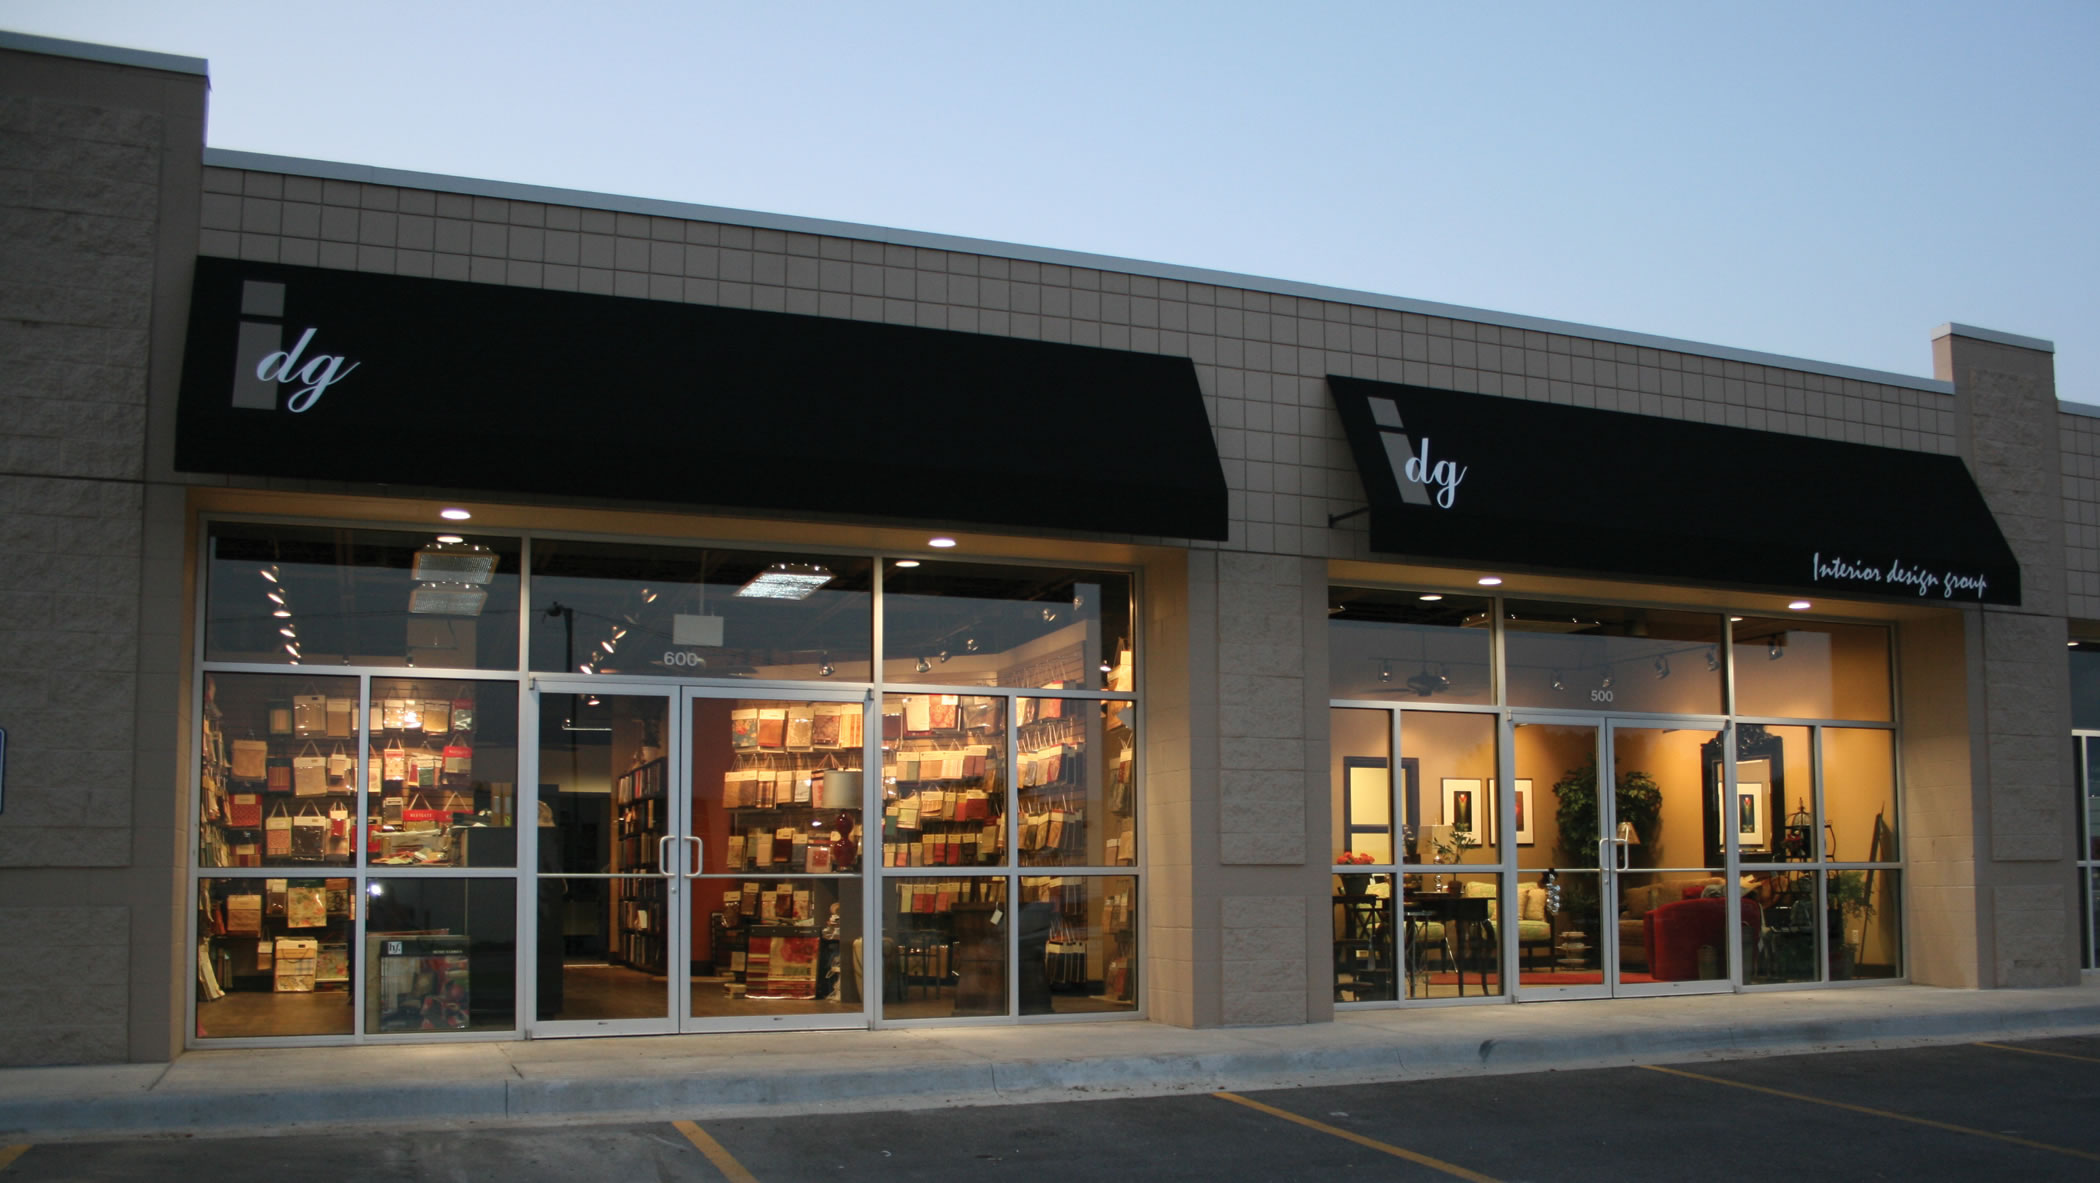 Interior Design Group 13748 F Street Suite 500 Omaha Nebraska 68137 Tel 402 398 9100